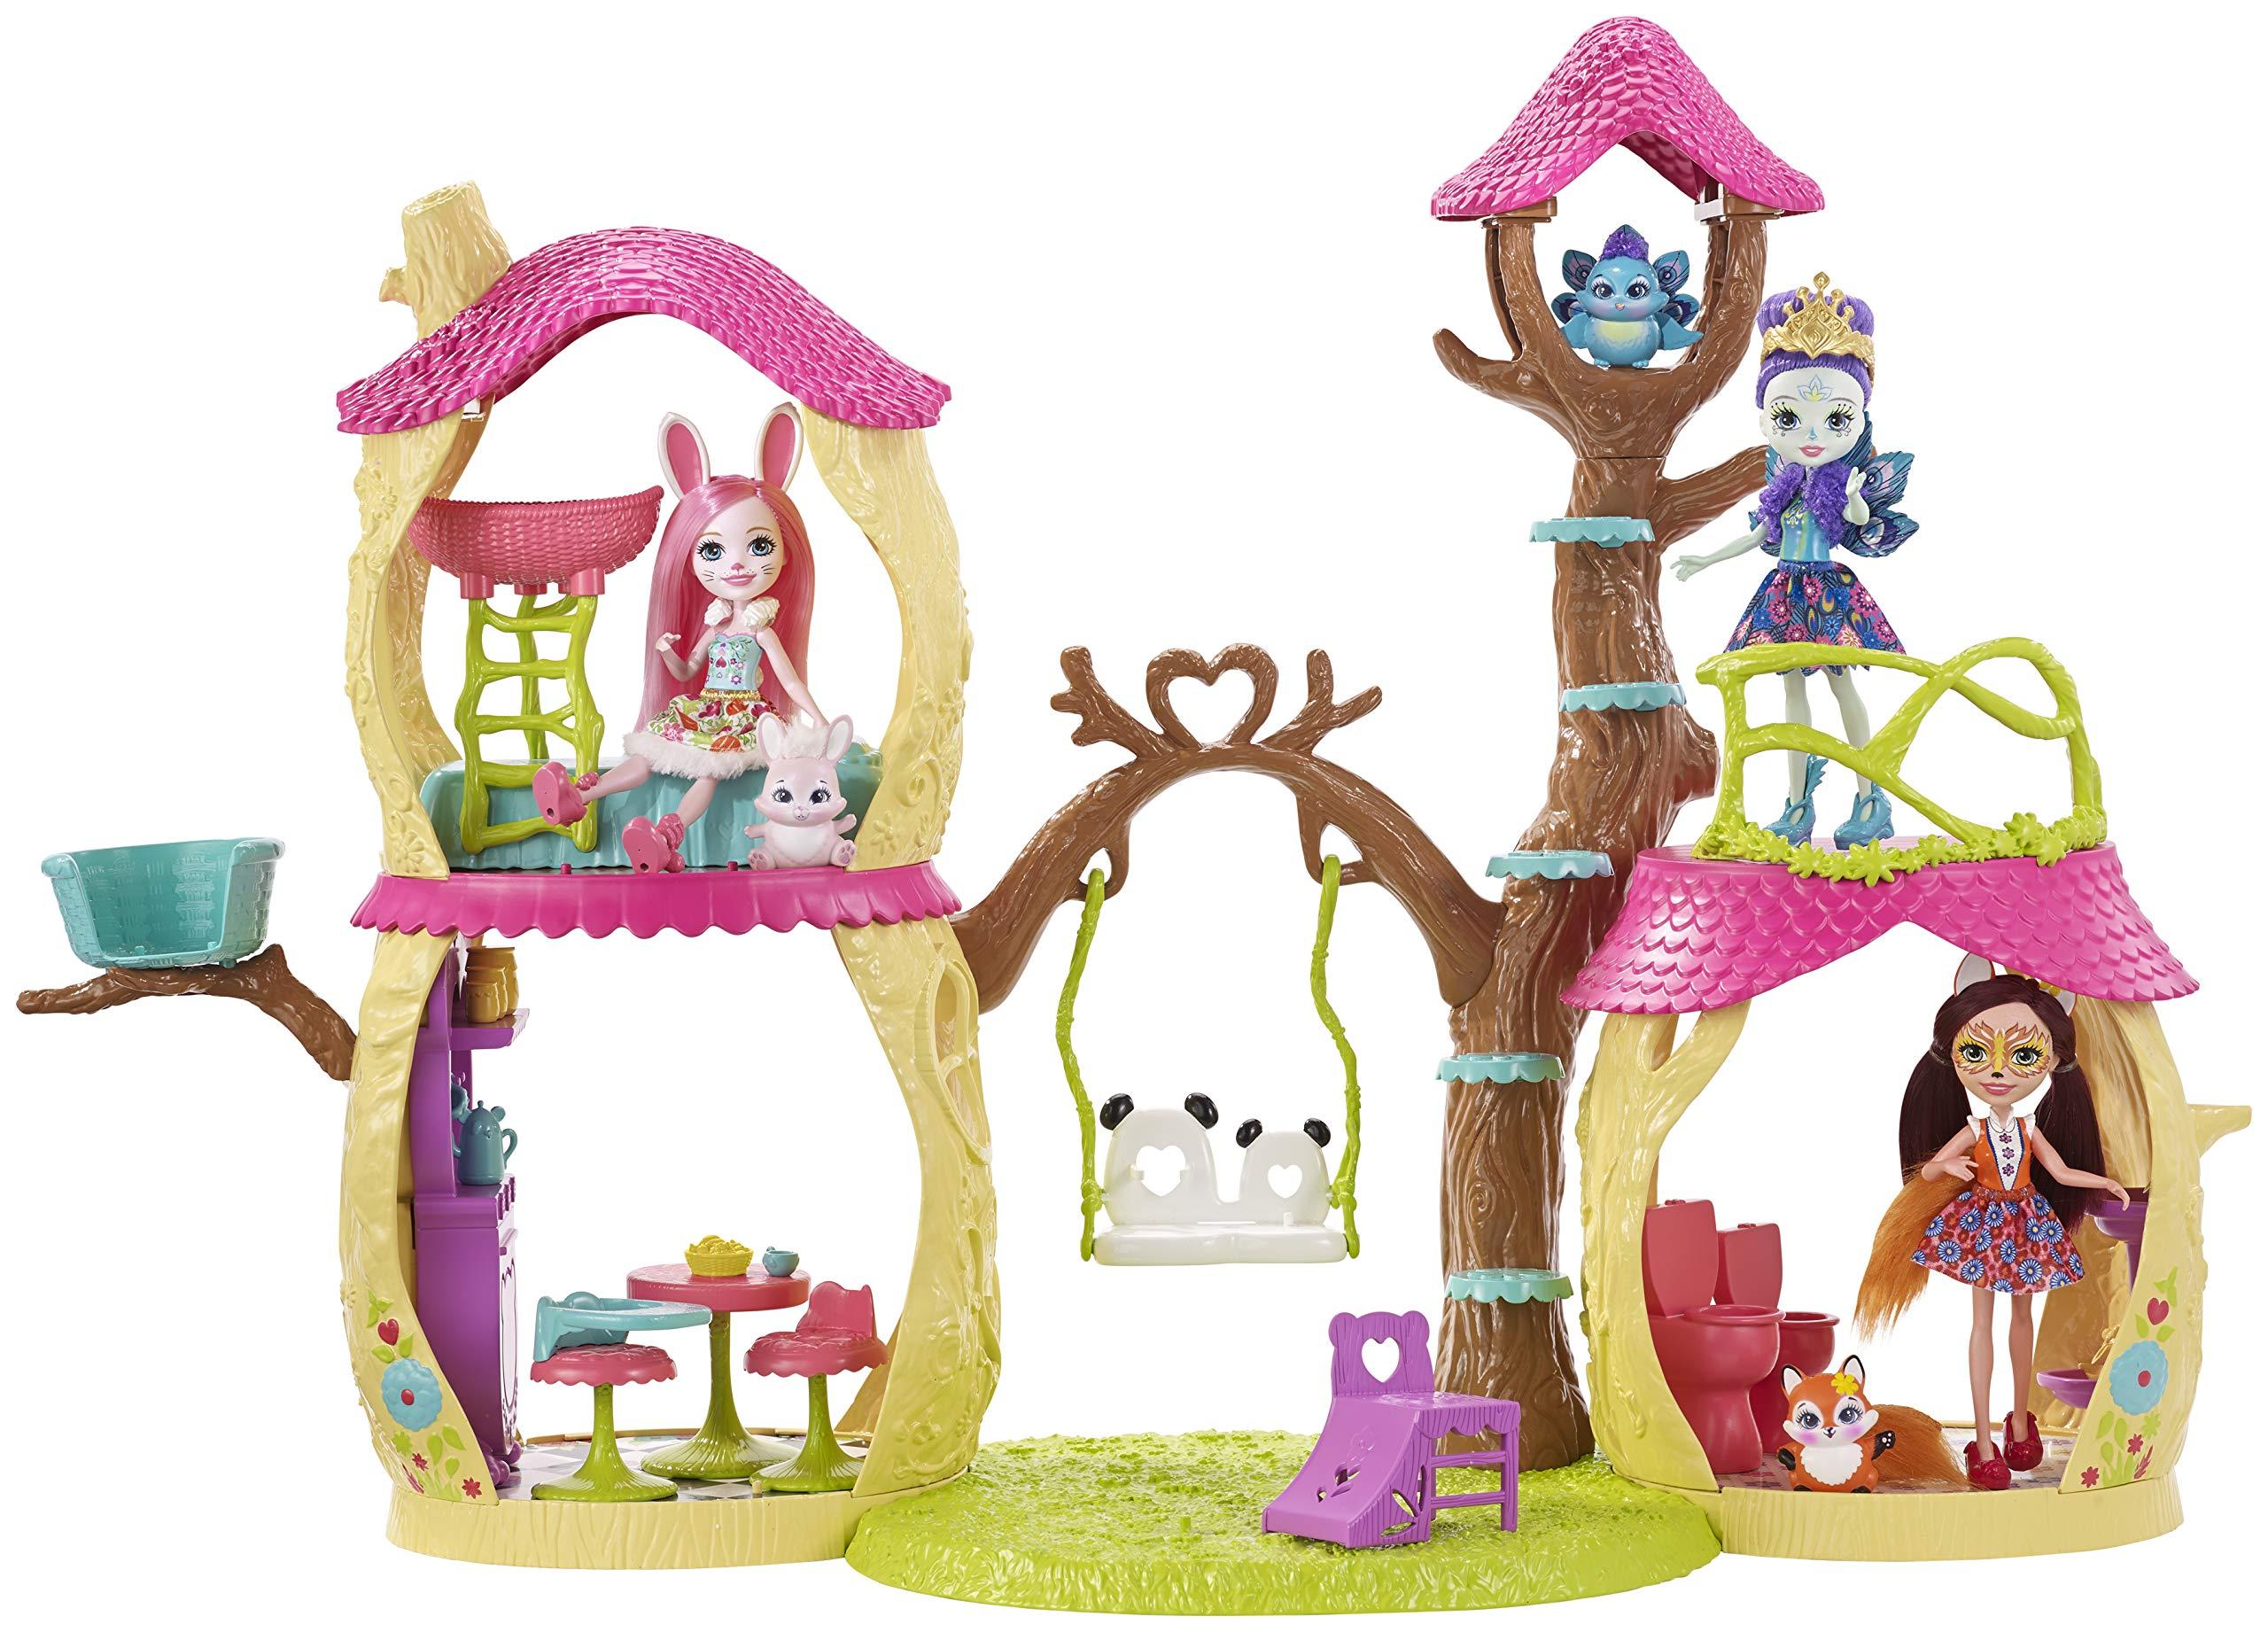 Enchantimals Casa Divertida Panda, casa de muñecas (Mattel FNM92) product image